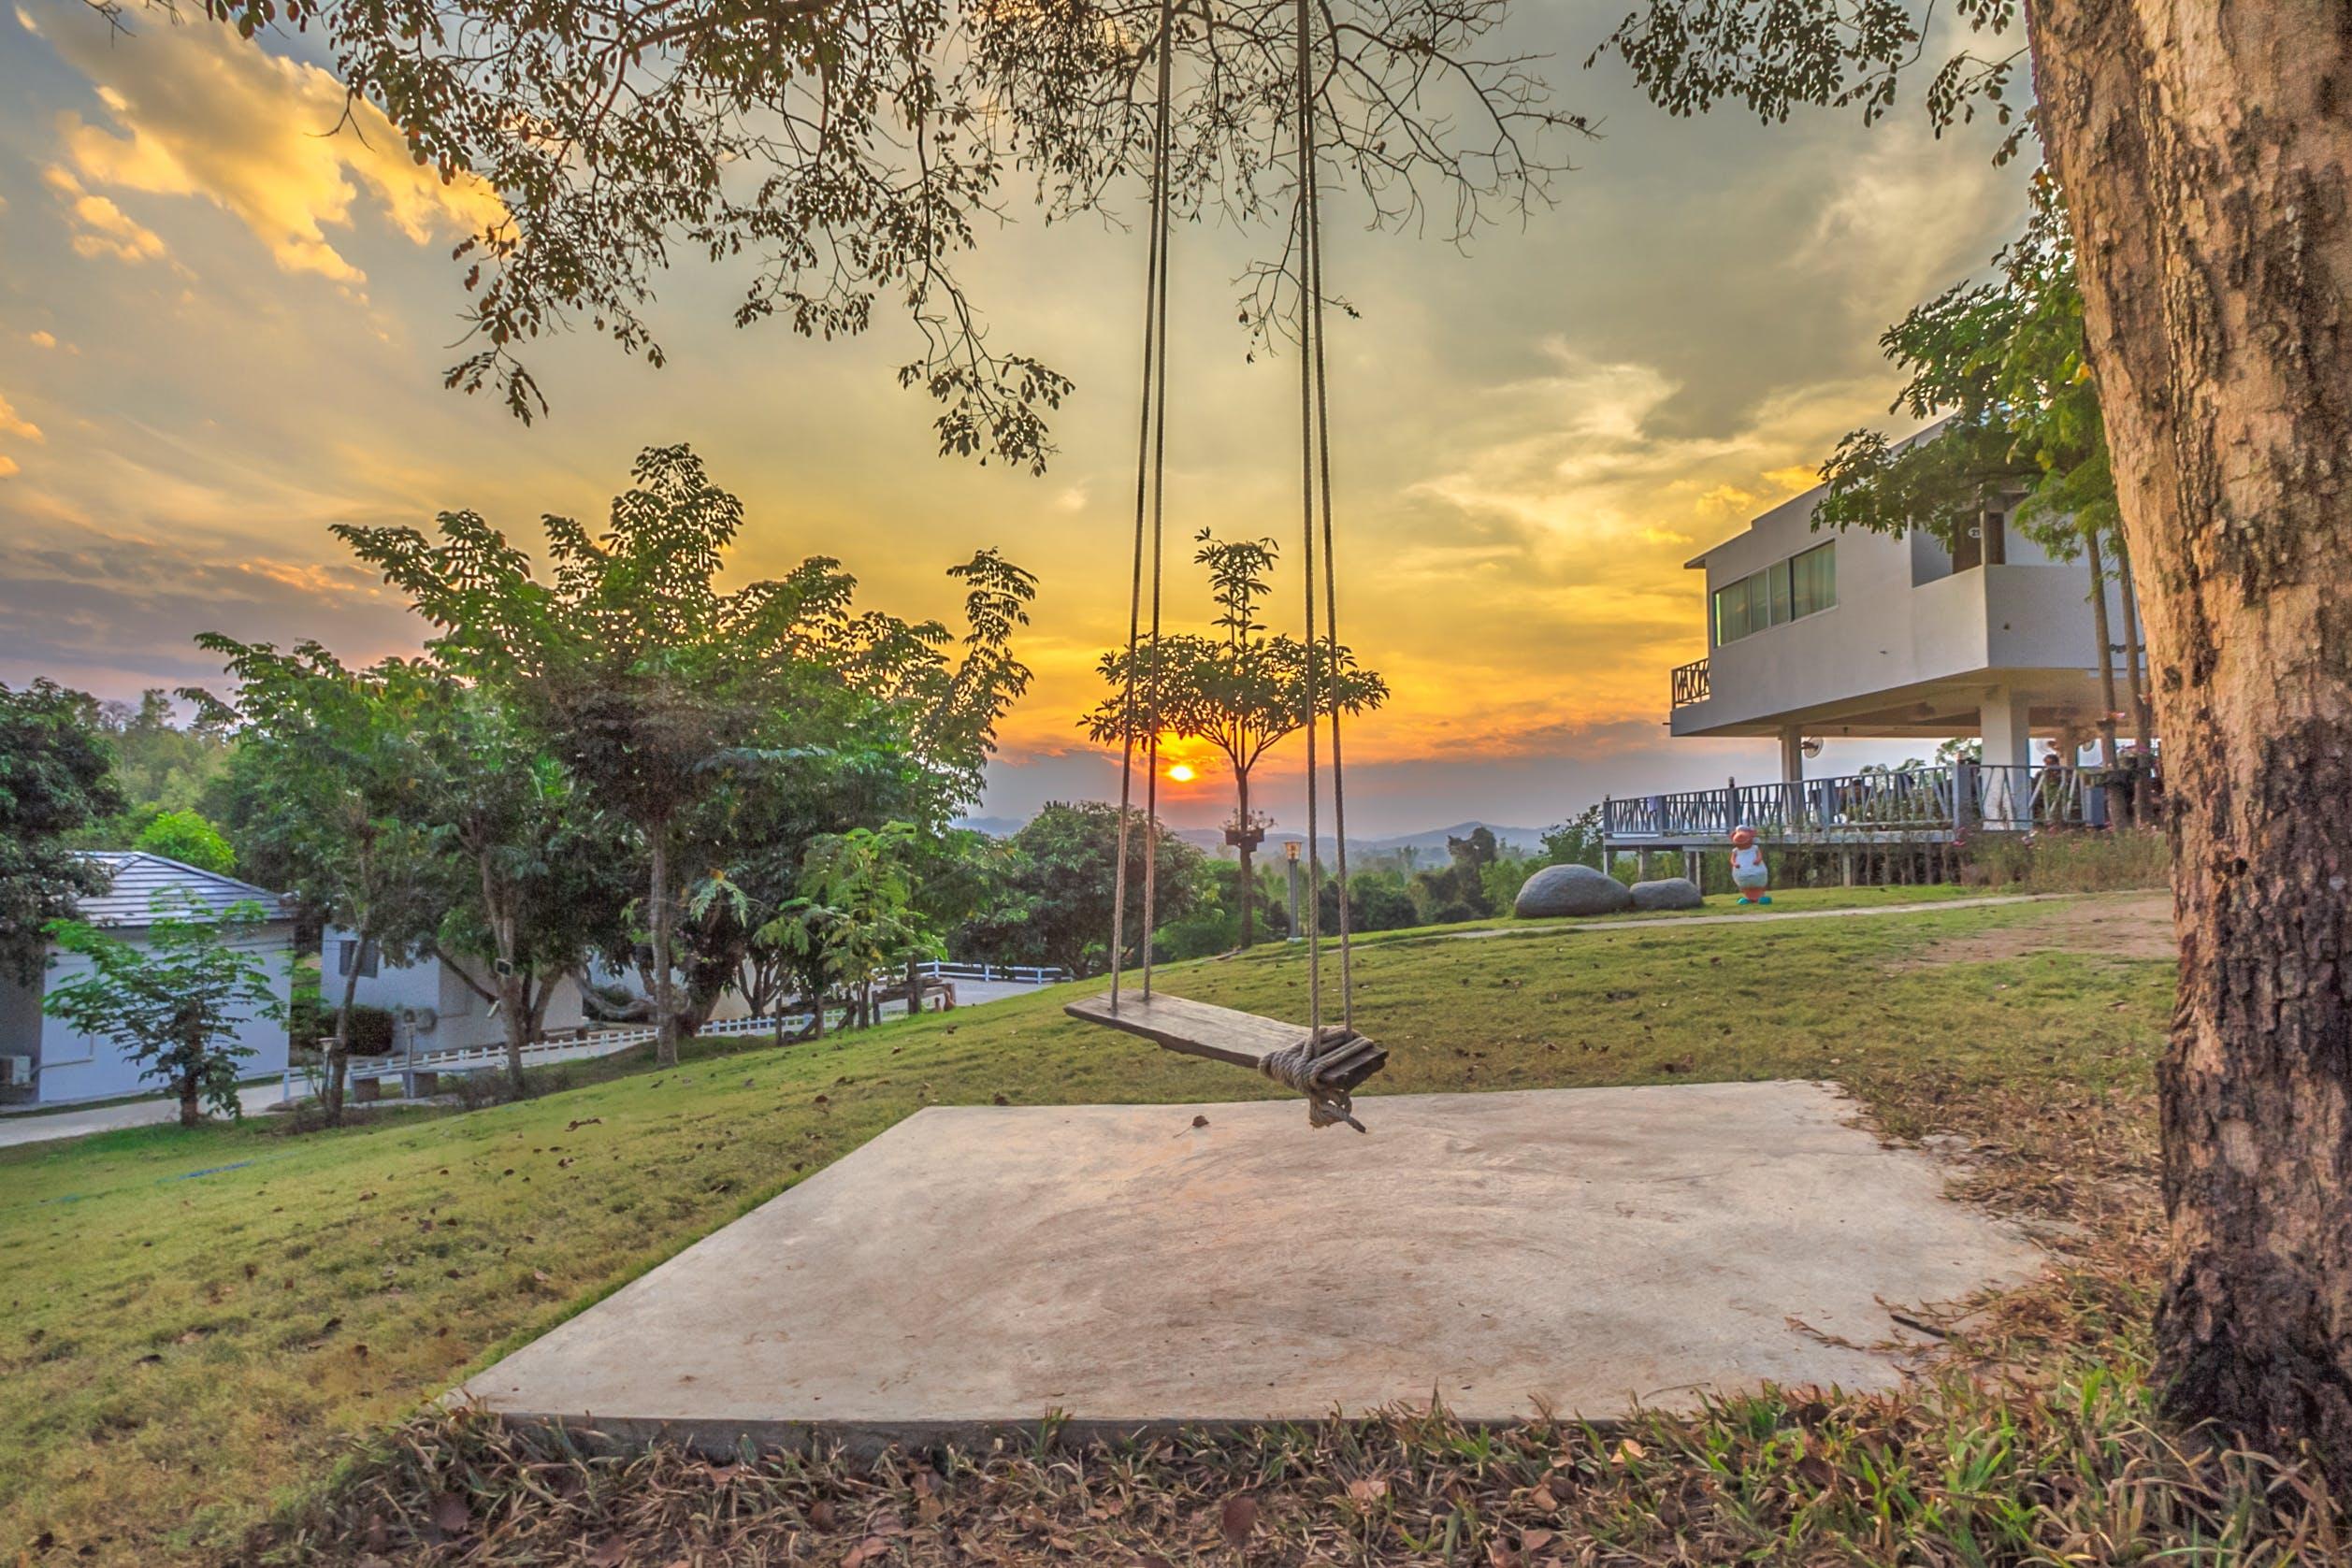 Gray Swing on Tree Photo during Sunest